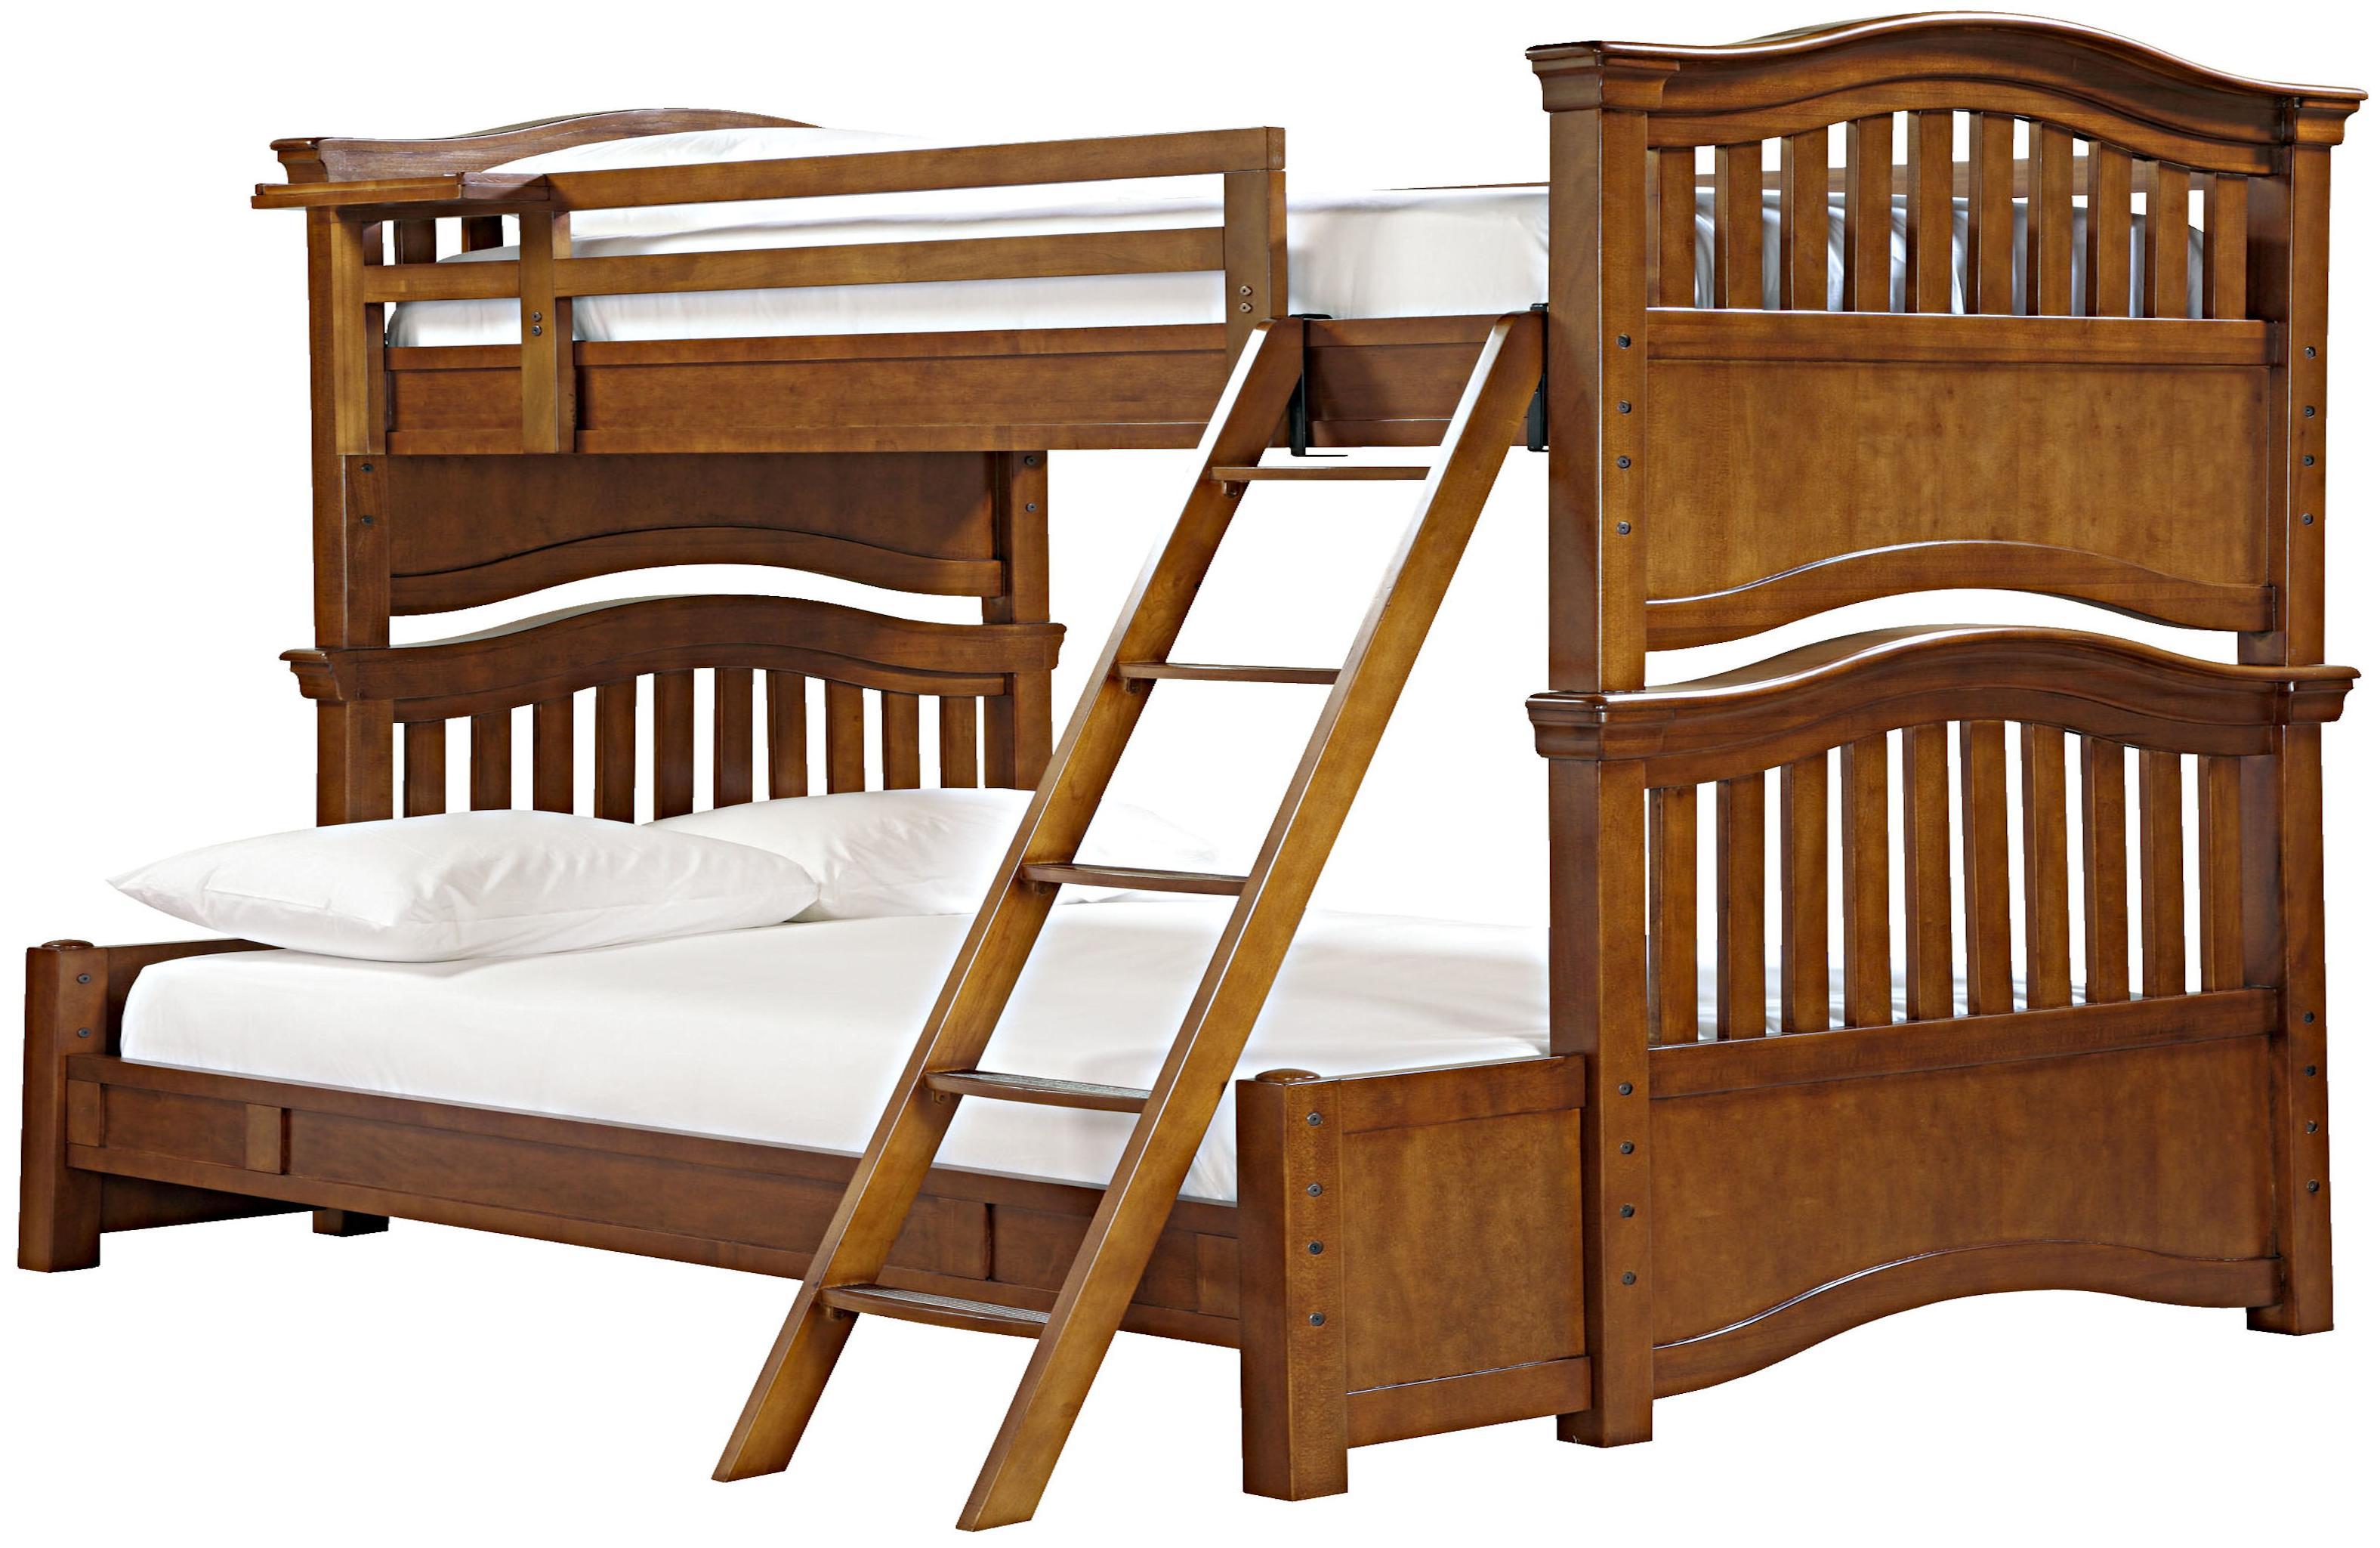 Smartstuff Classics 4.0 Twin Over Full Bunk Bed - Item Number: 1311590